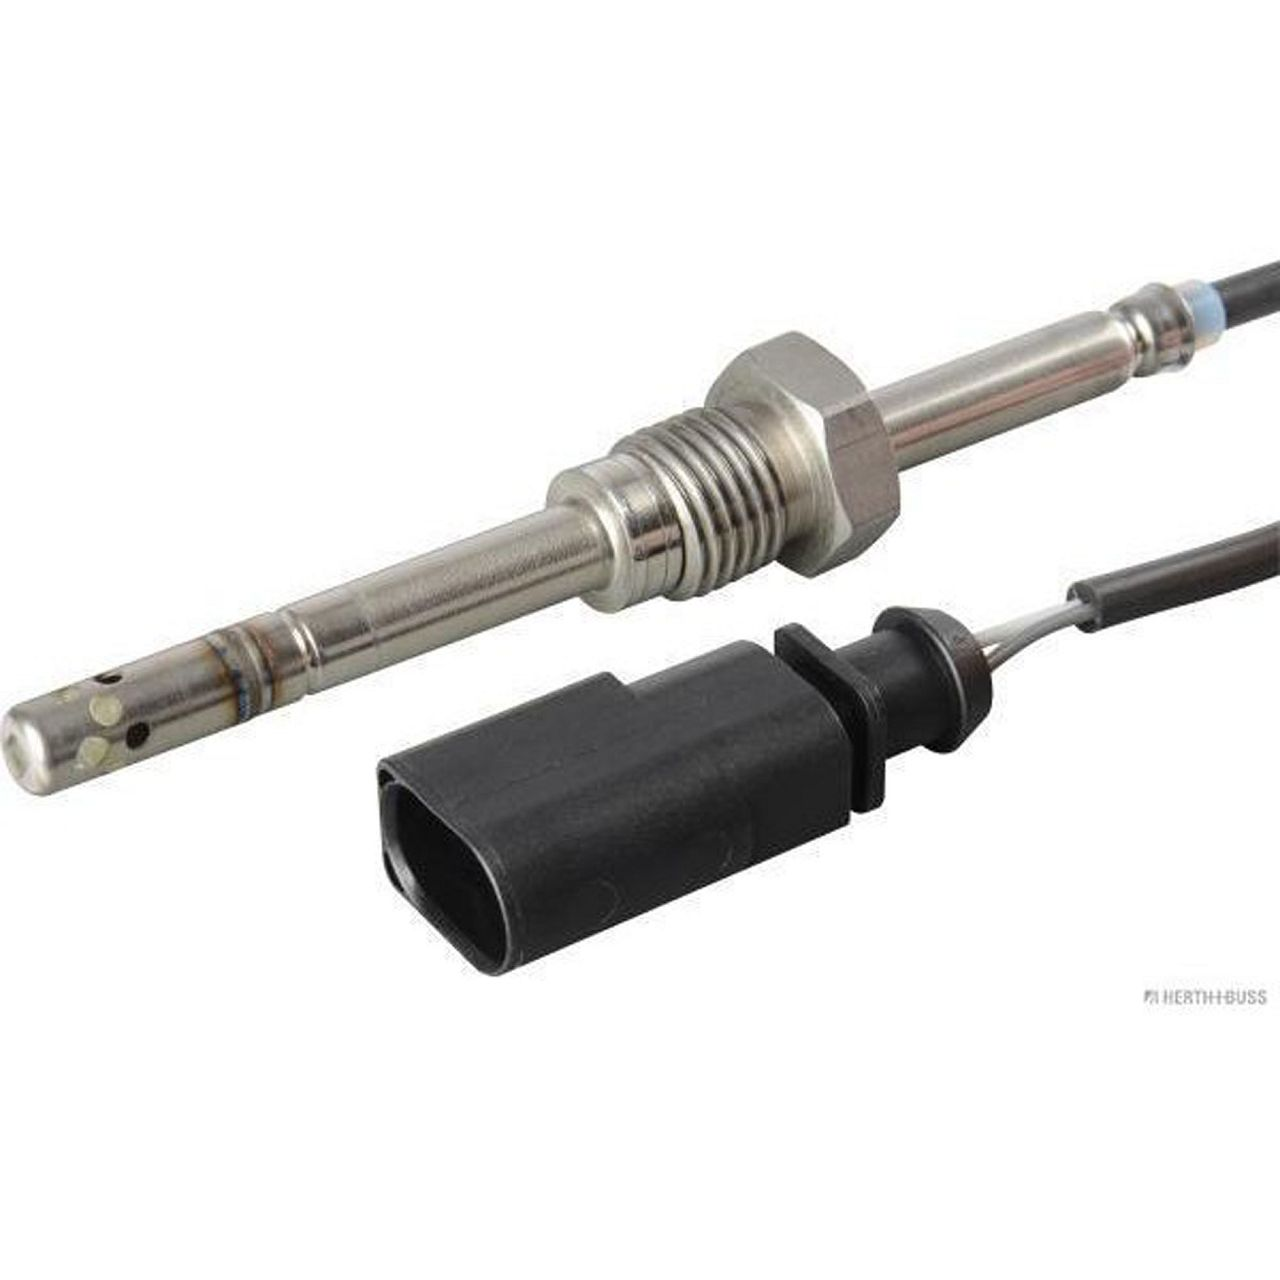 HERTH+BUSS ELPARTS Abgastemperatursensor für AUDI A6 C6 + A6 AVANT + A6 ALLRAD